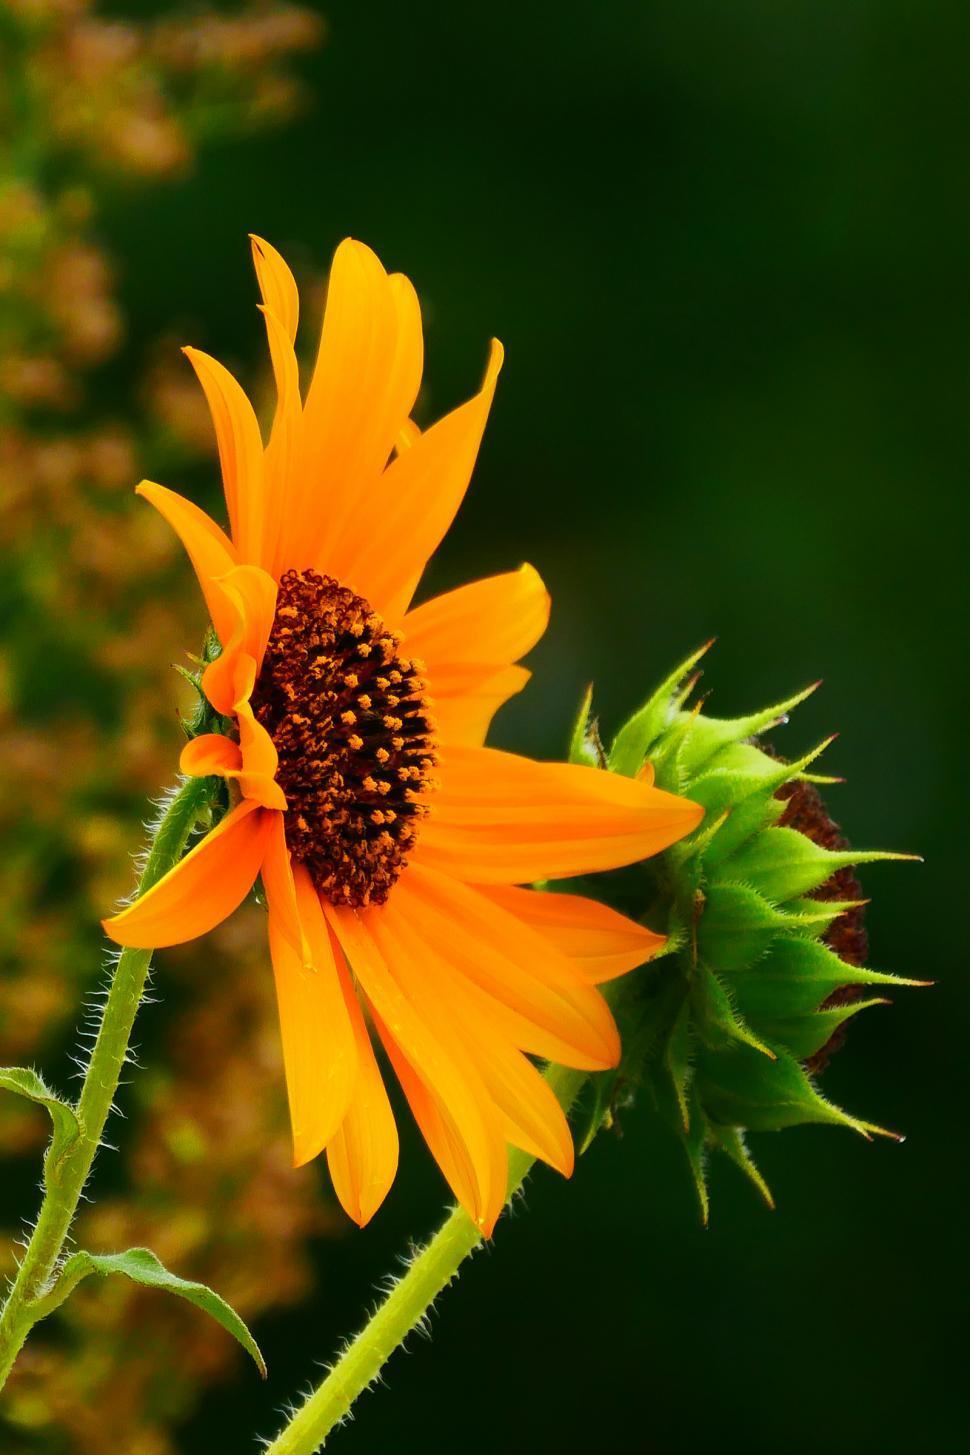 Download Free Stock Photo of Yellow Sunflower Flower Full Bloom